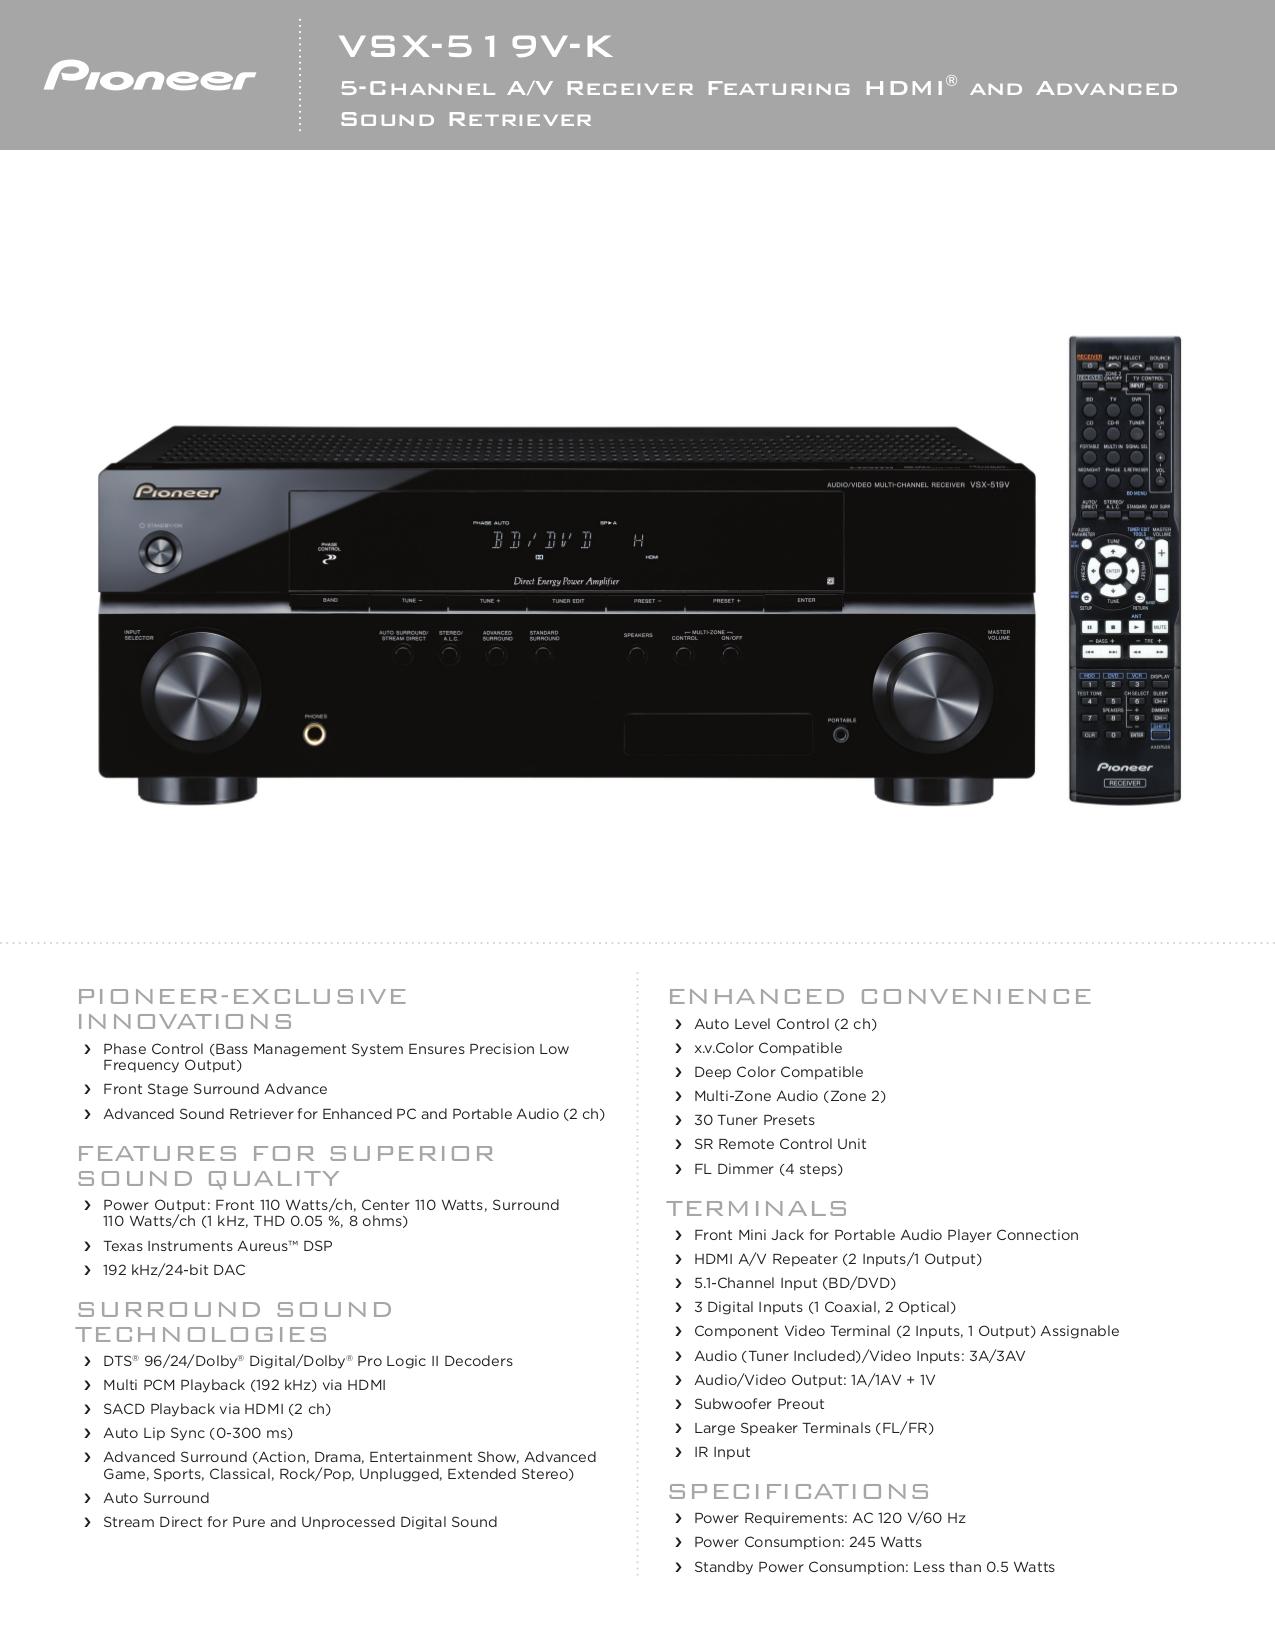 Pioneer vsx-519v-k av receiver gloss manual.